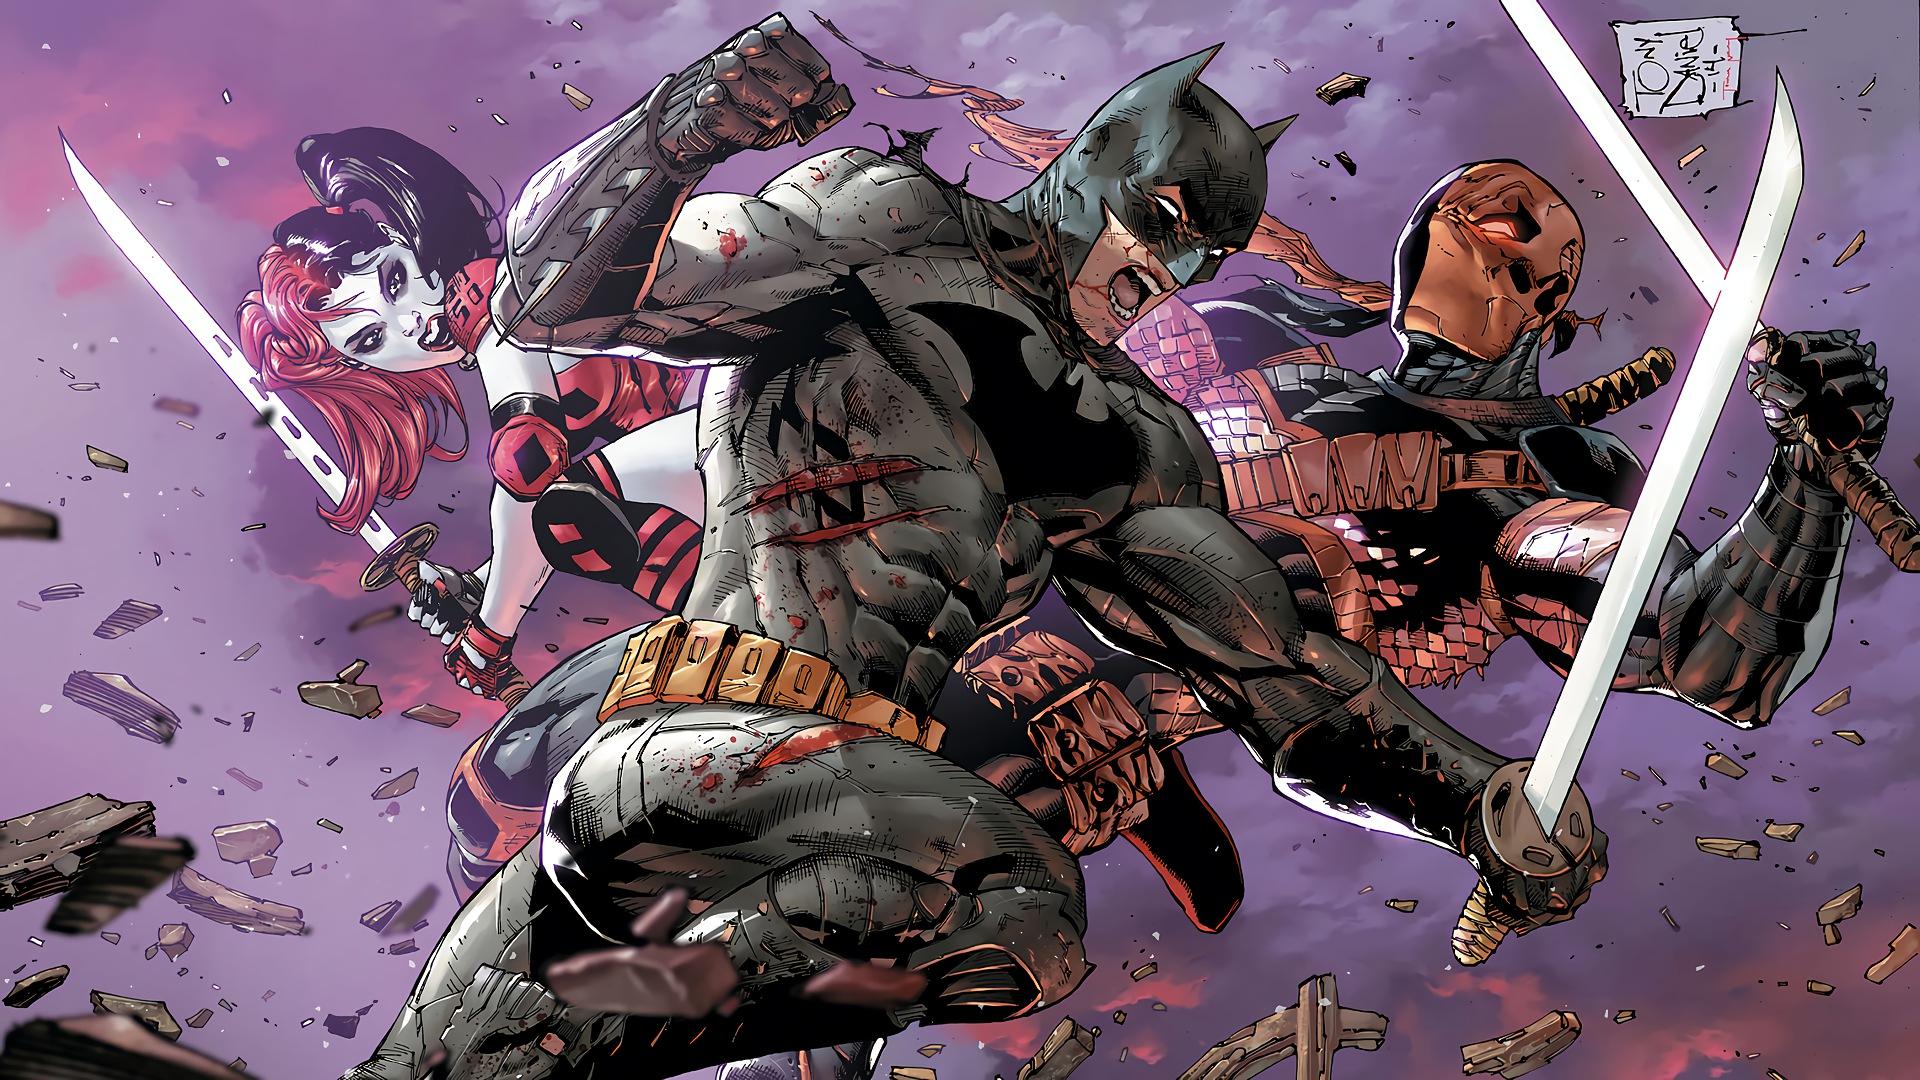 batman vs deathstroke full hd wallpaper and background